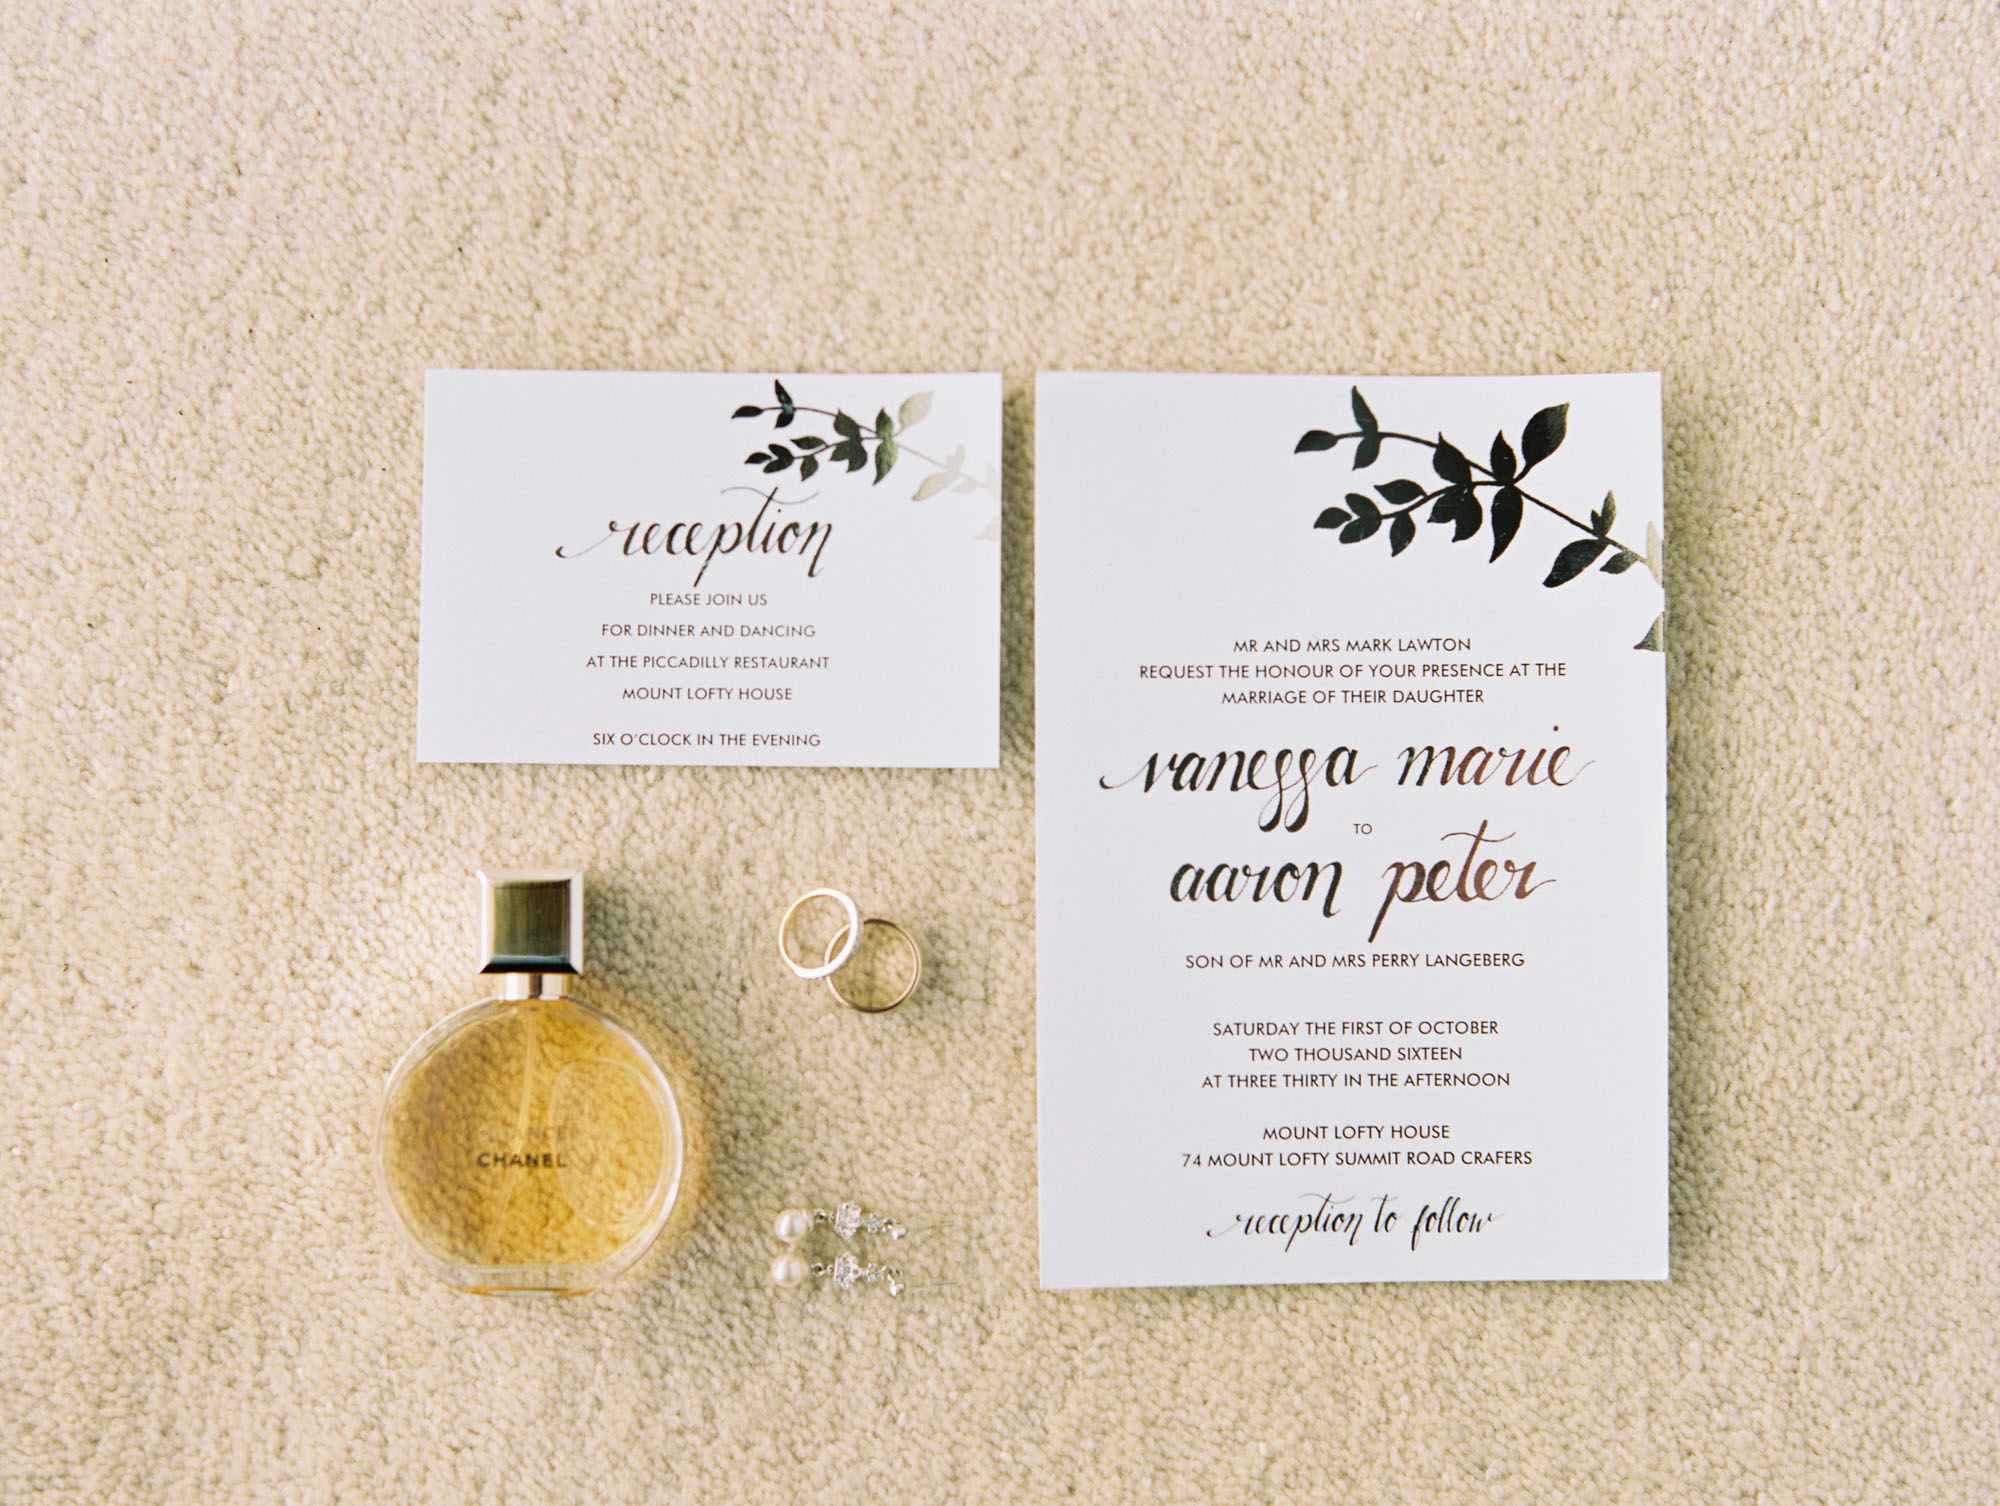 Mount-Lofty-House-wedding-photography-015.jpg